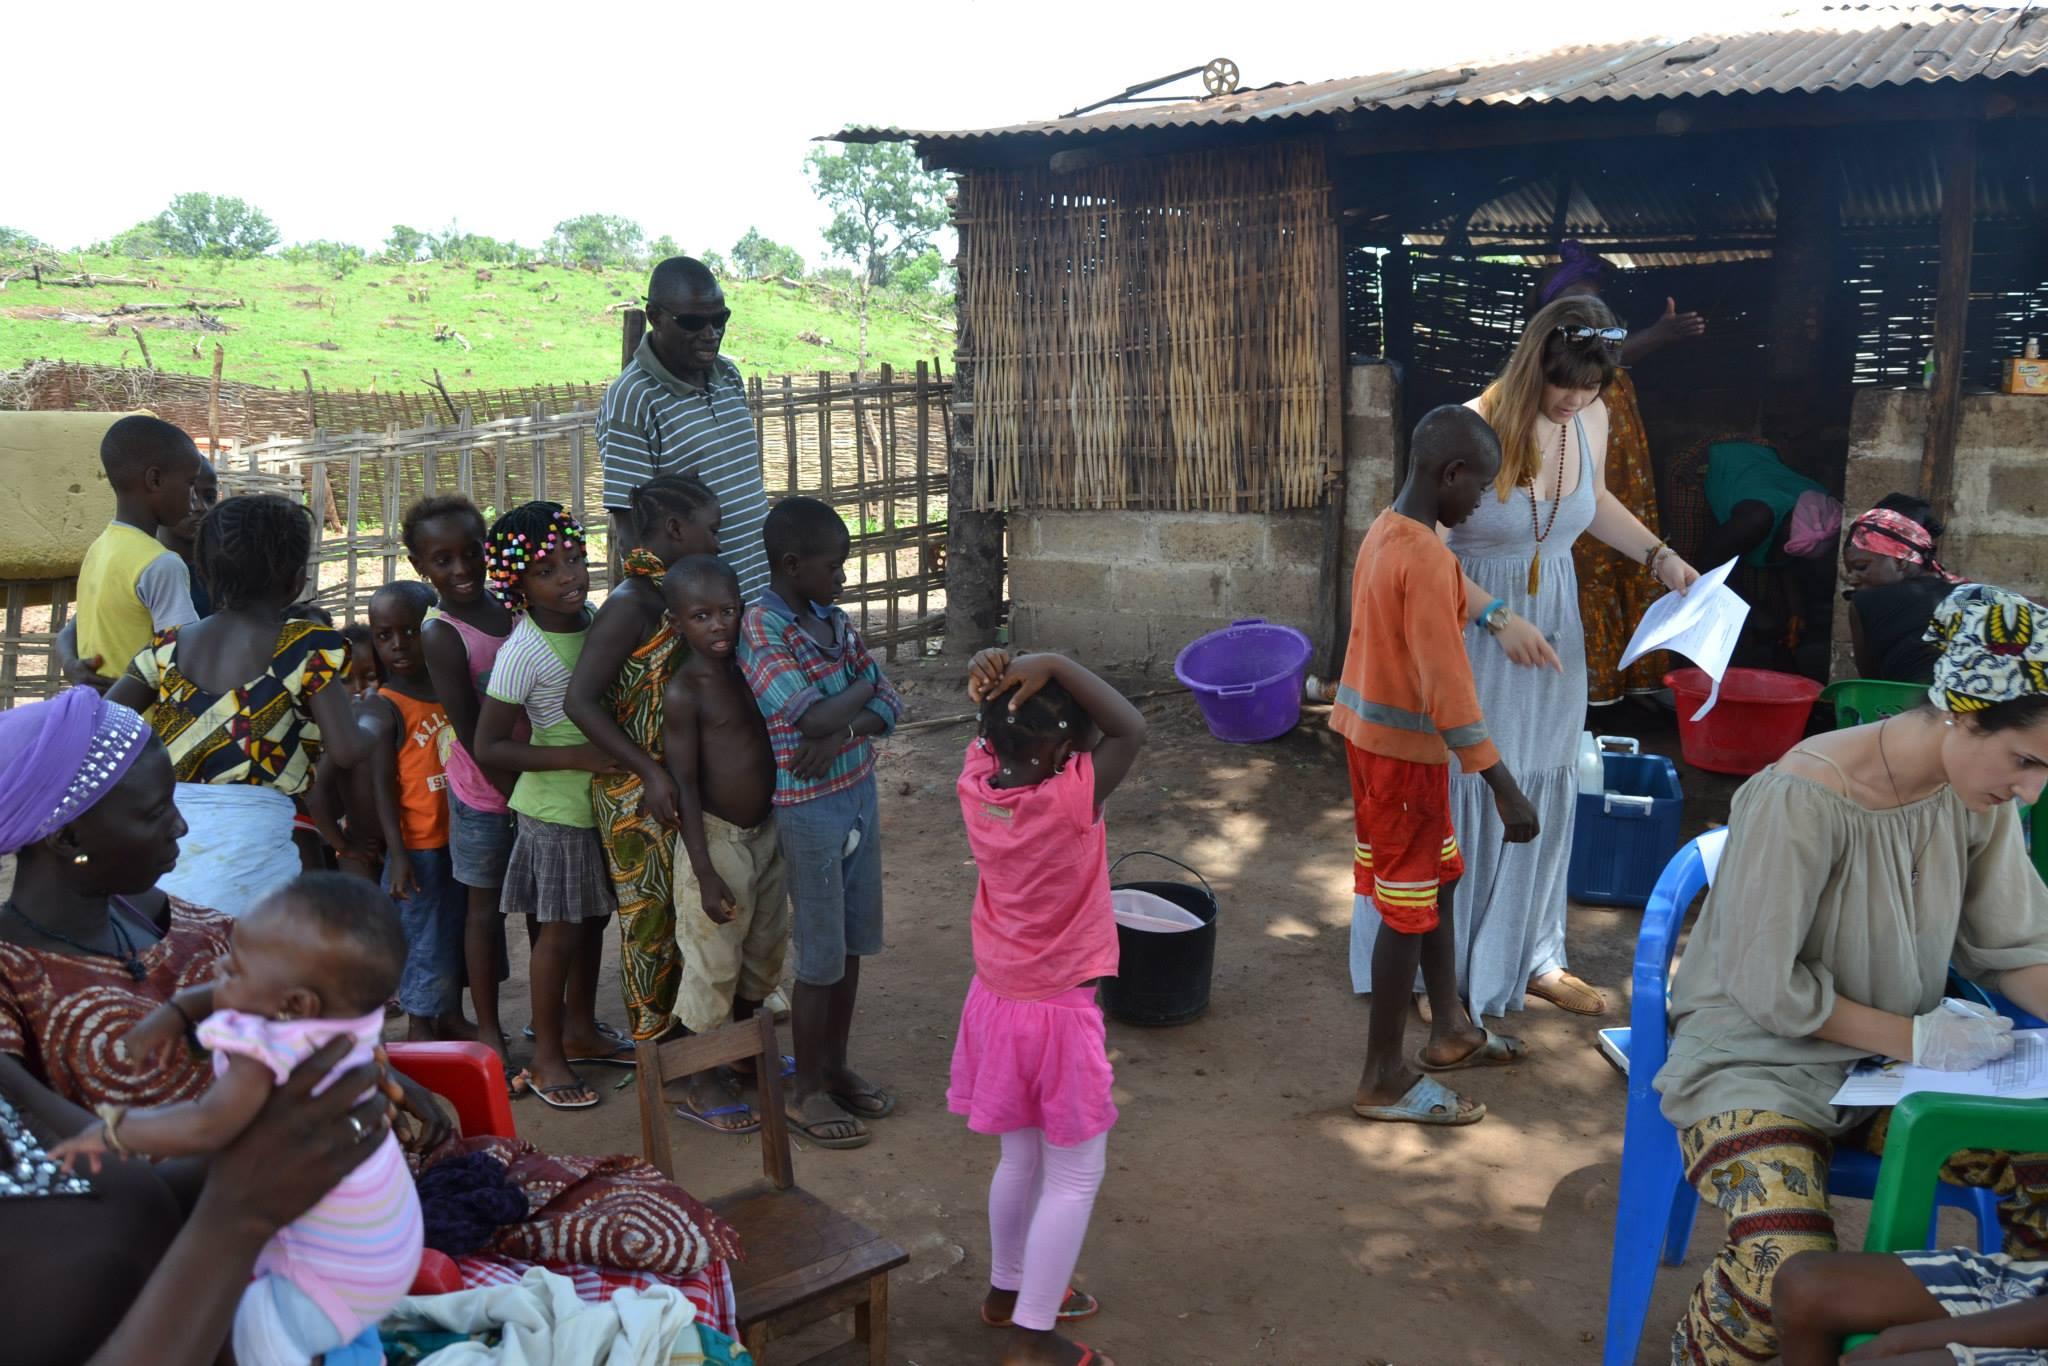 Checking children's teeth in Geba.